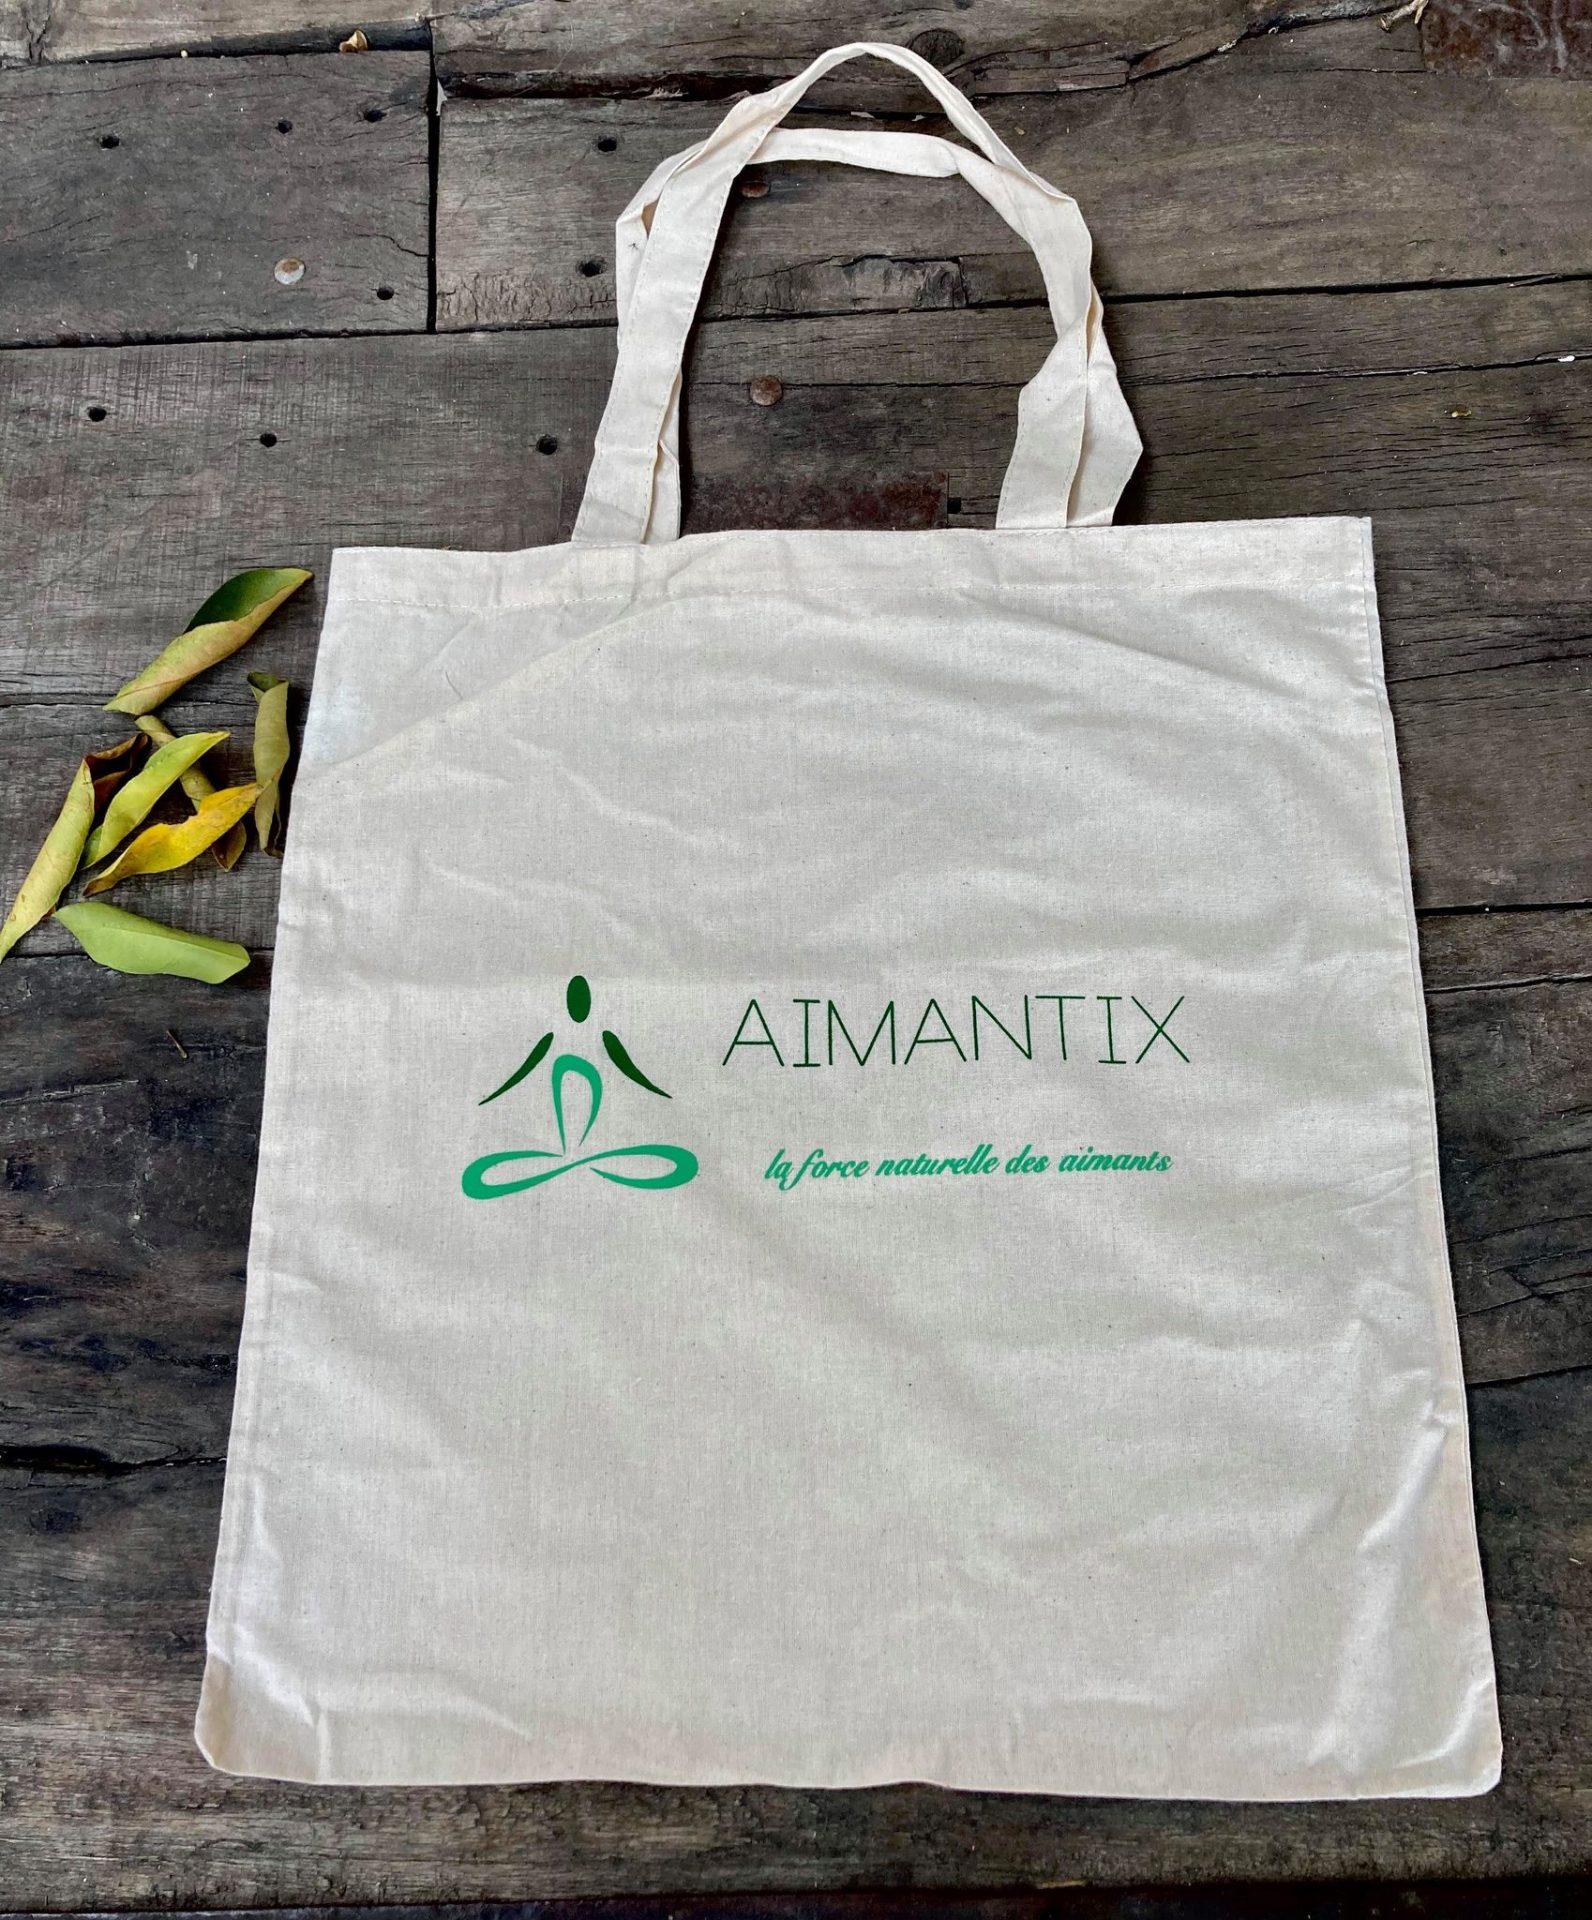 [FOCUS SUR …] AIMANTIX